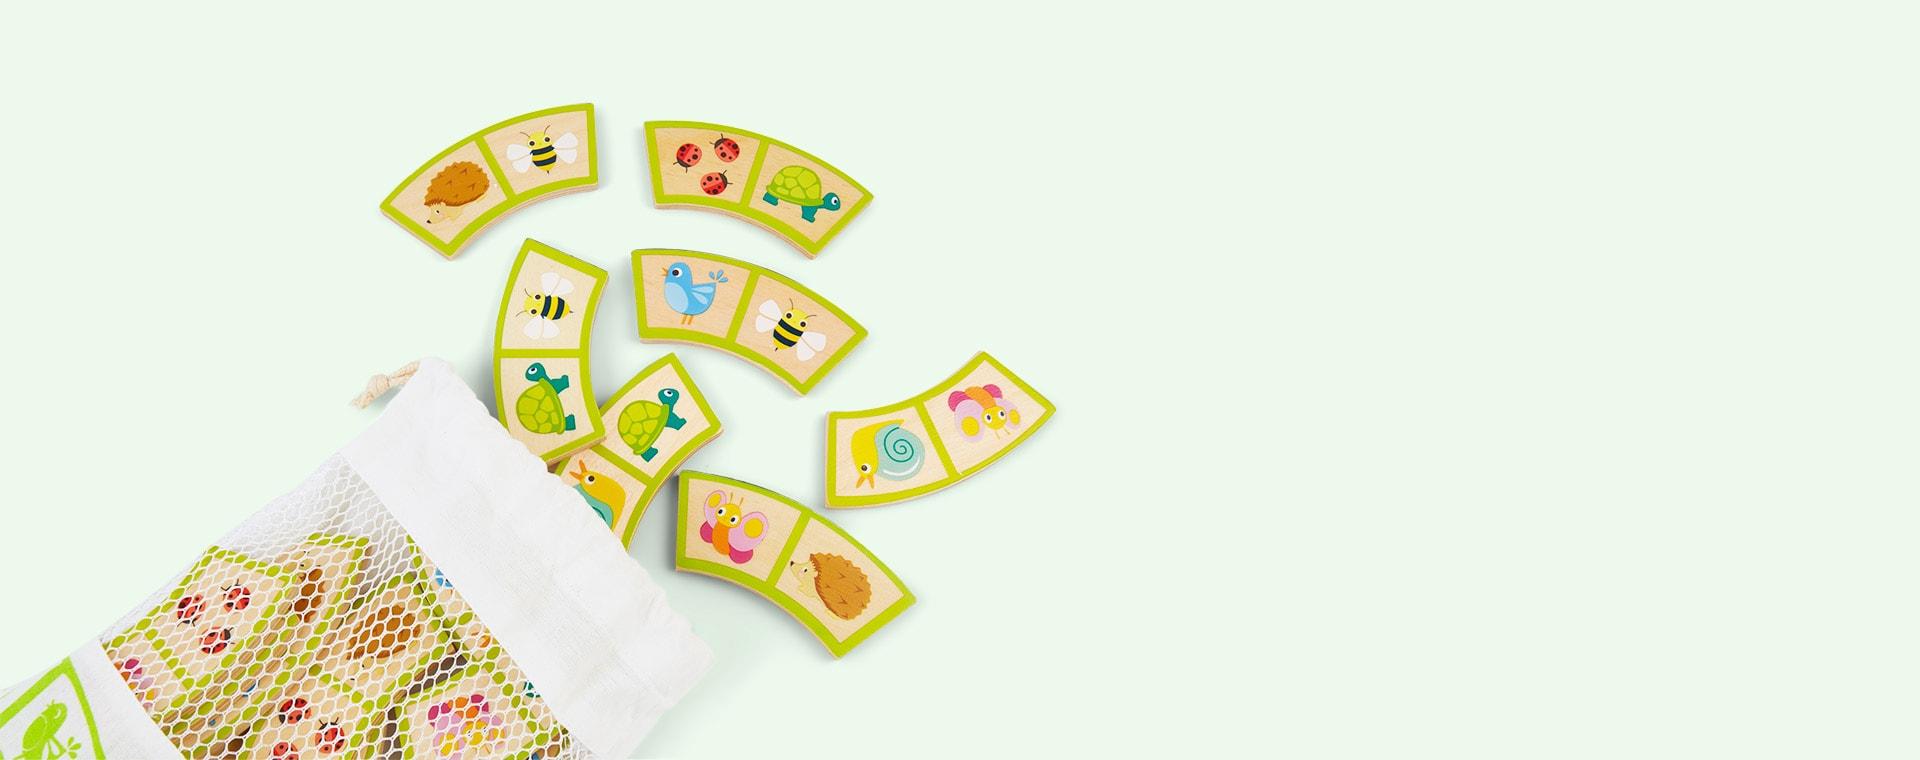 Multi Tender Leaf Toys Garden Path Dominoes